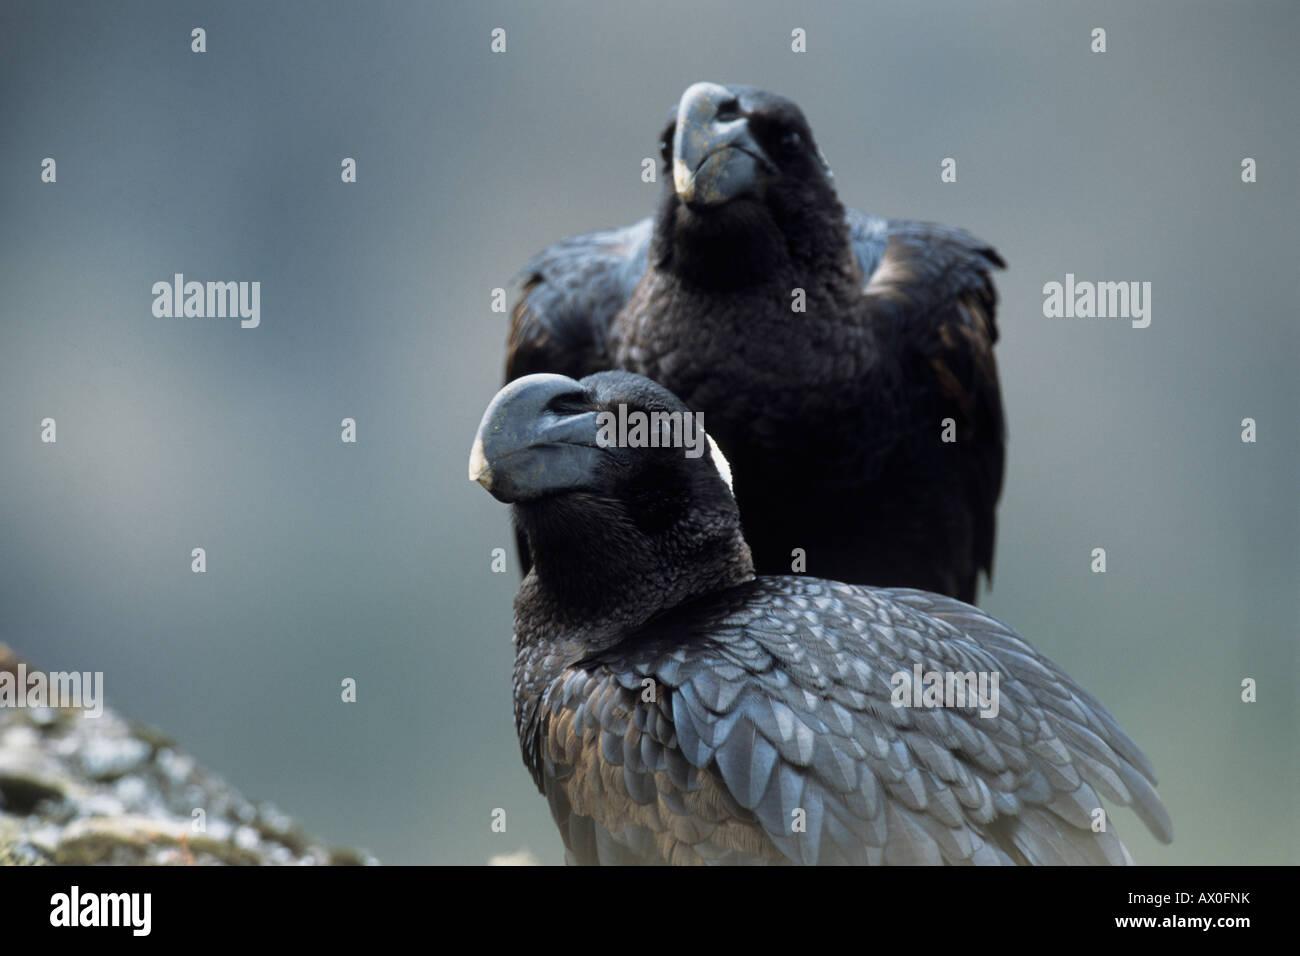 Pair of Thick-billed Raven (Corvus crassirostris), portrait, largest songbird, semi-endemic, Semien Mountain Natinal - Stock Image